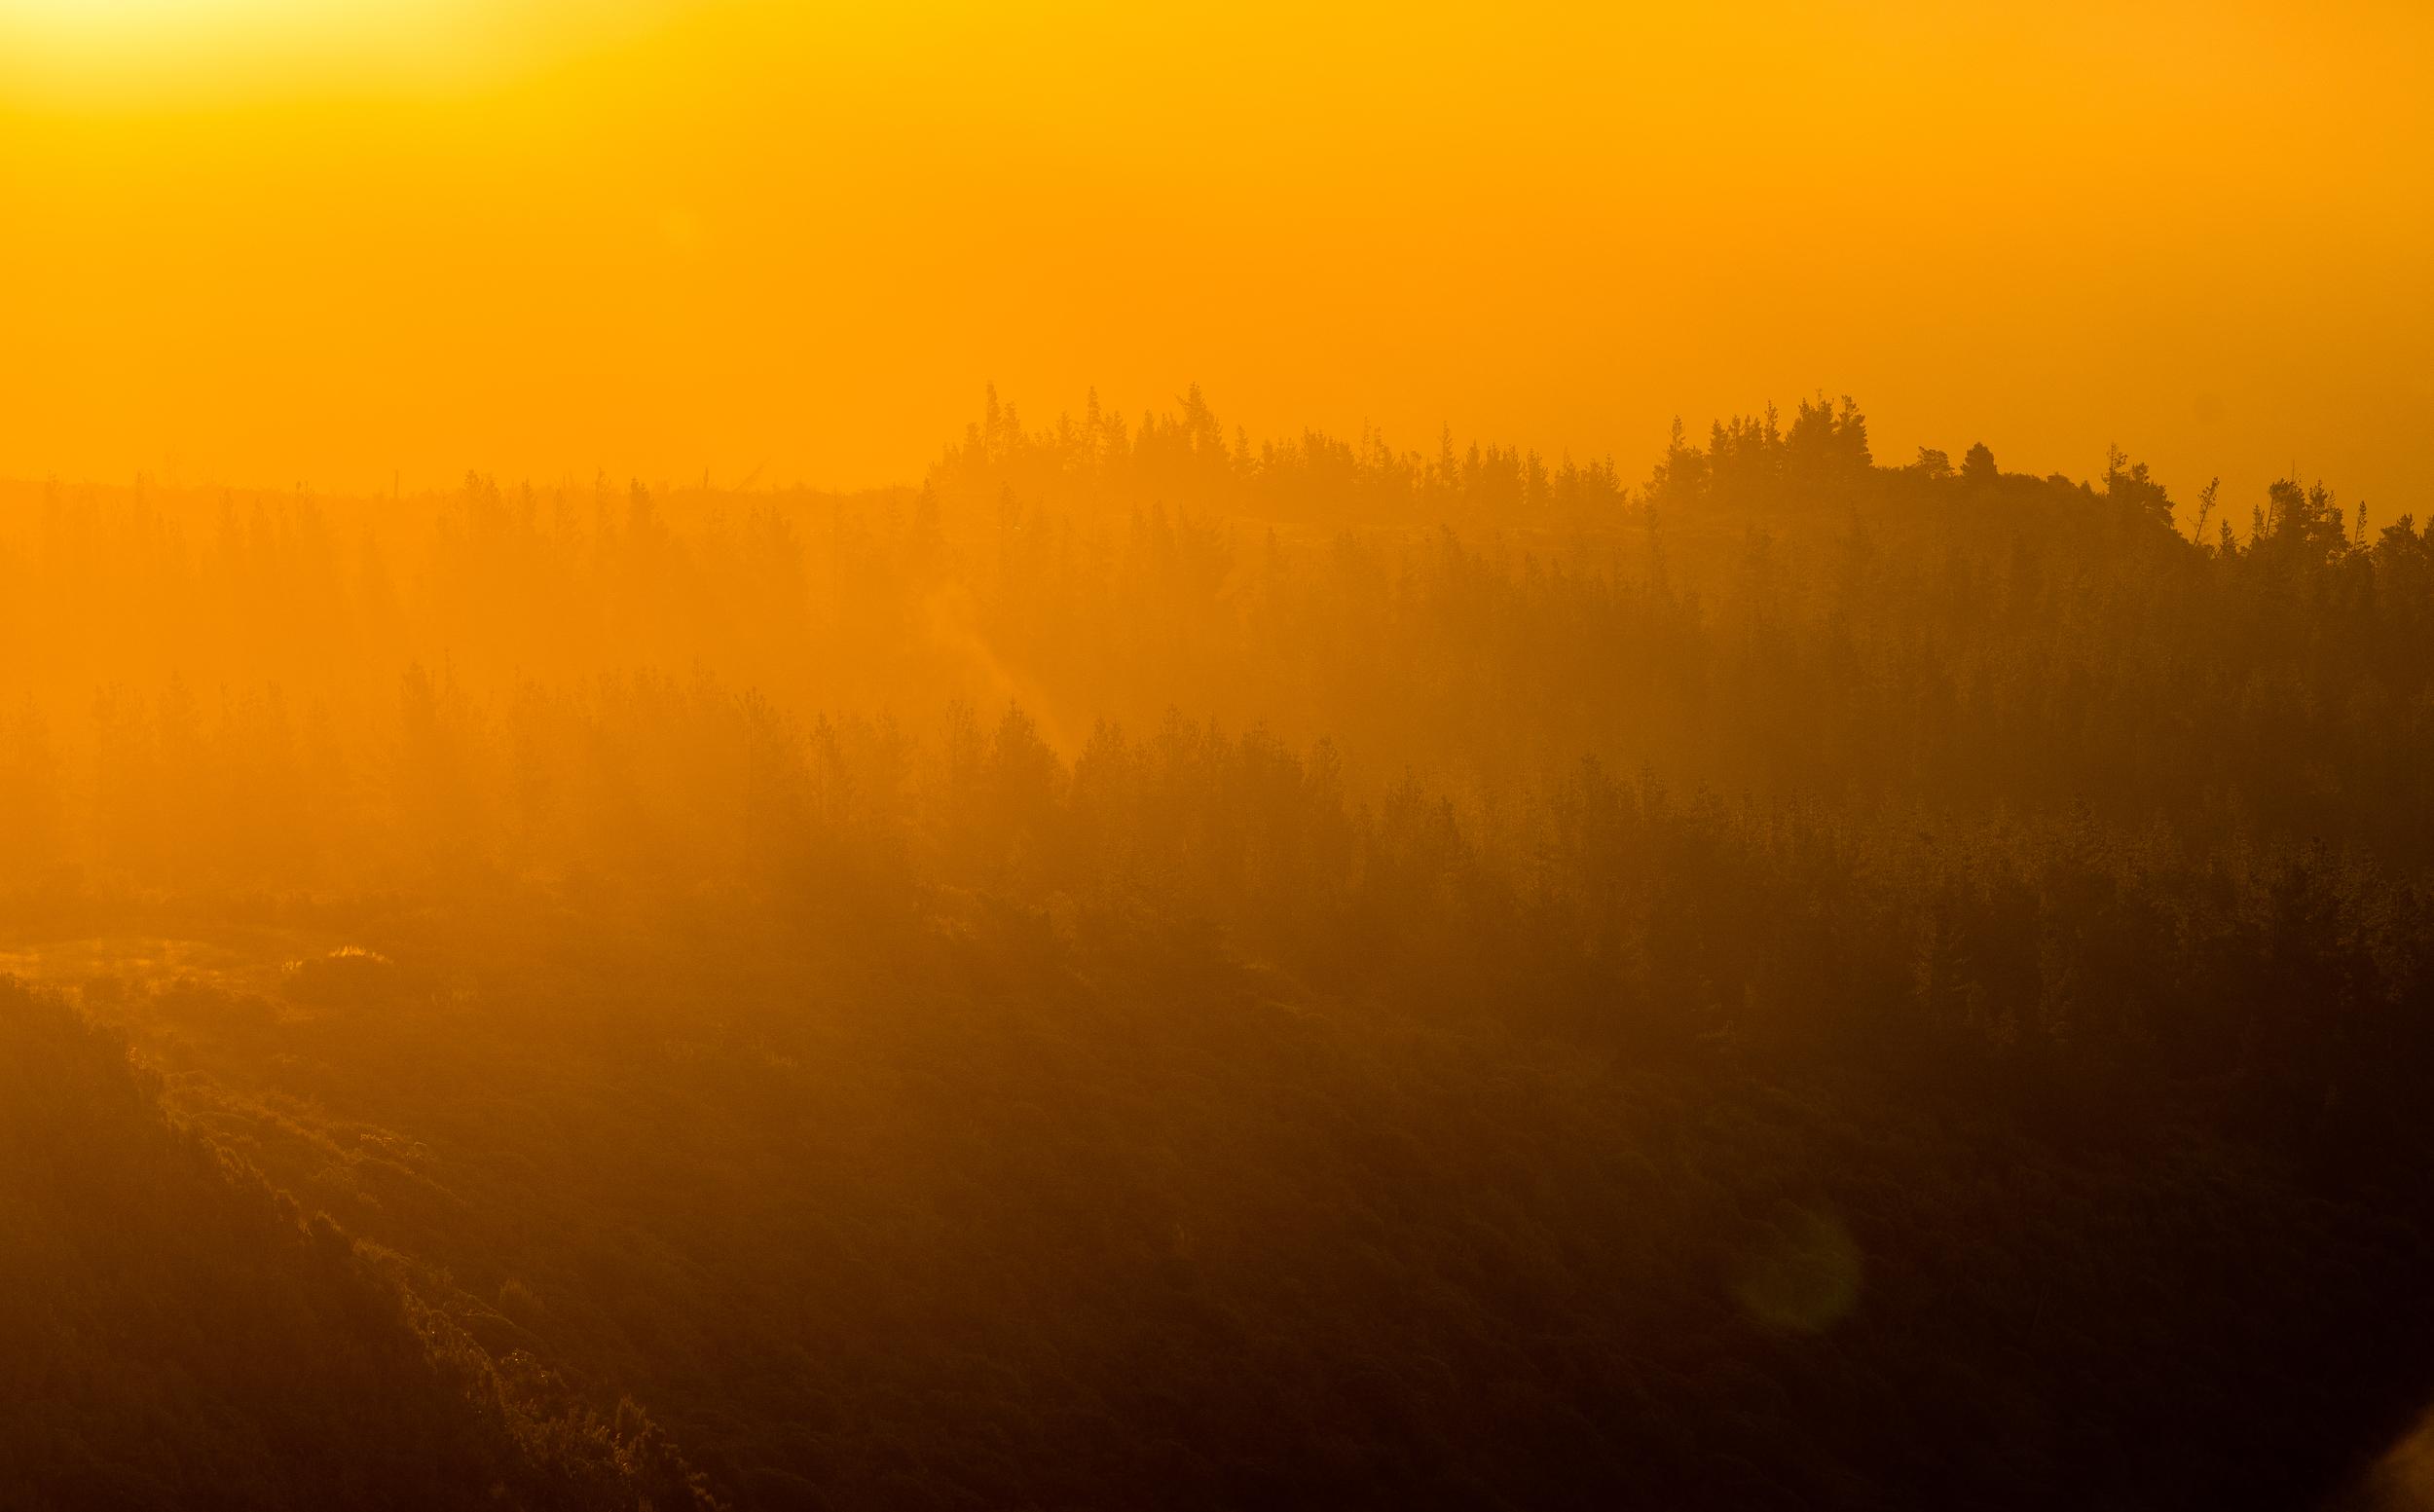 cargill-golden hour-03-may2016-fbook (1 of 1).jpg